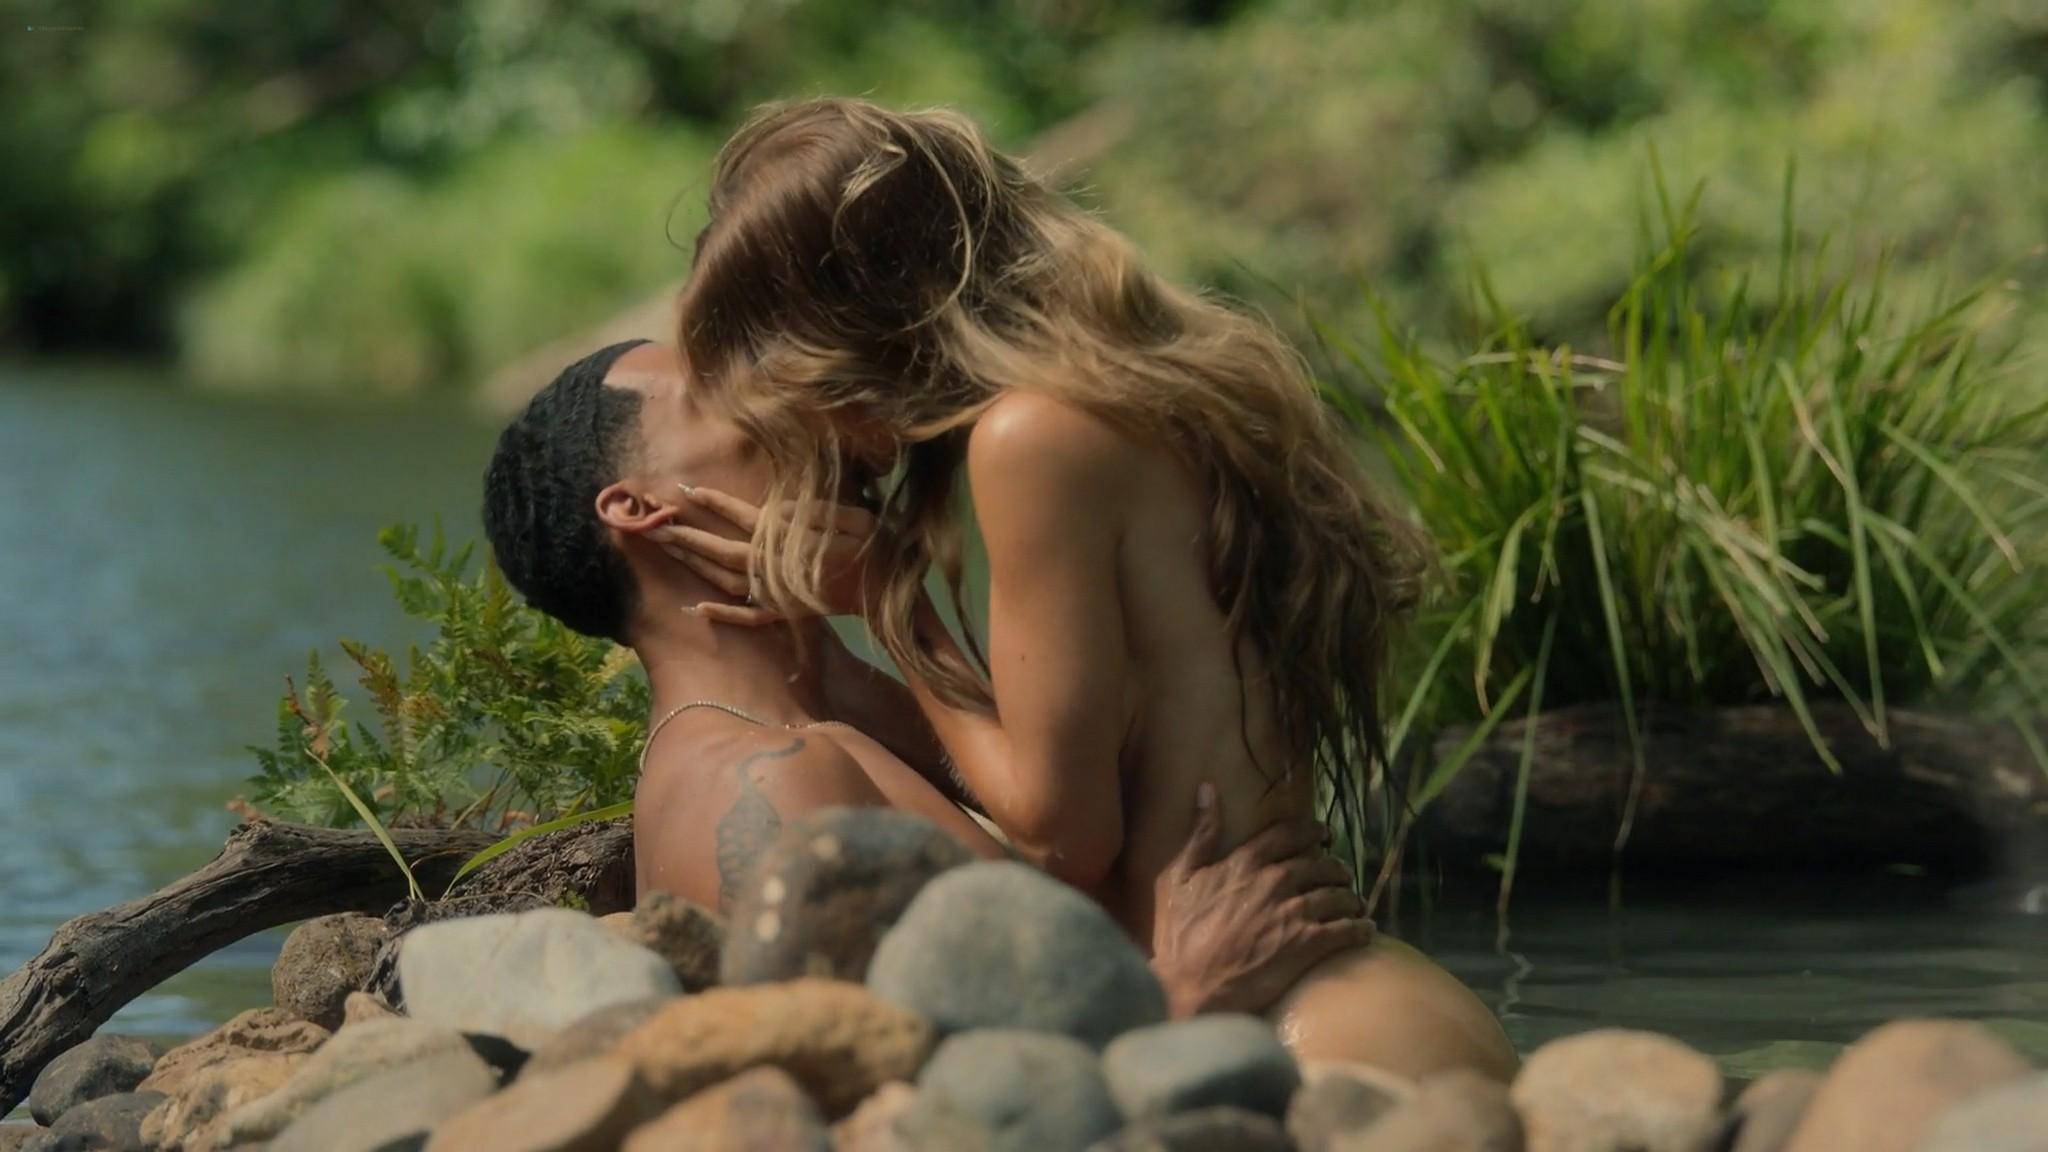 Samara Weaving hot sex Nicole Kidman and others sexy Nine Perfect Strangers 2021 s1e5 1080p 13